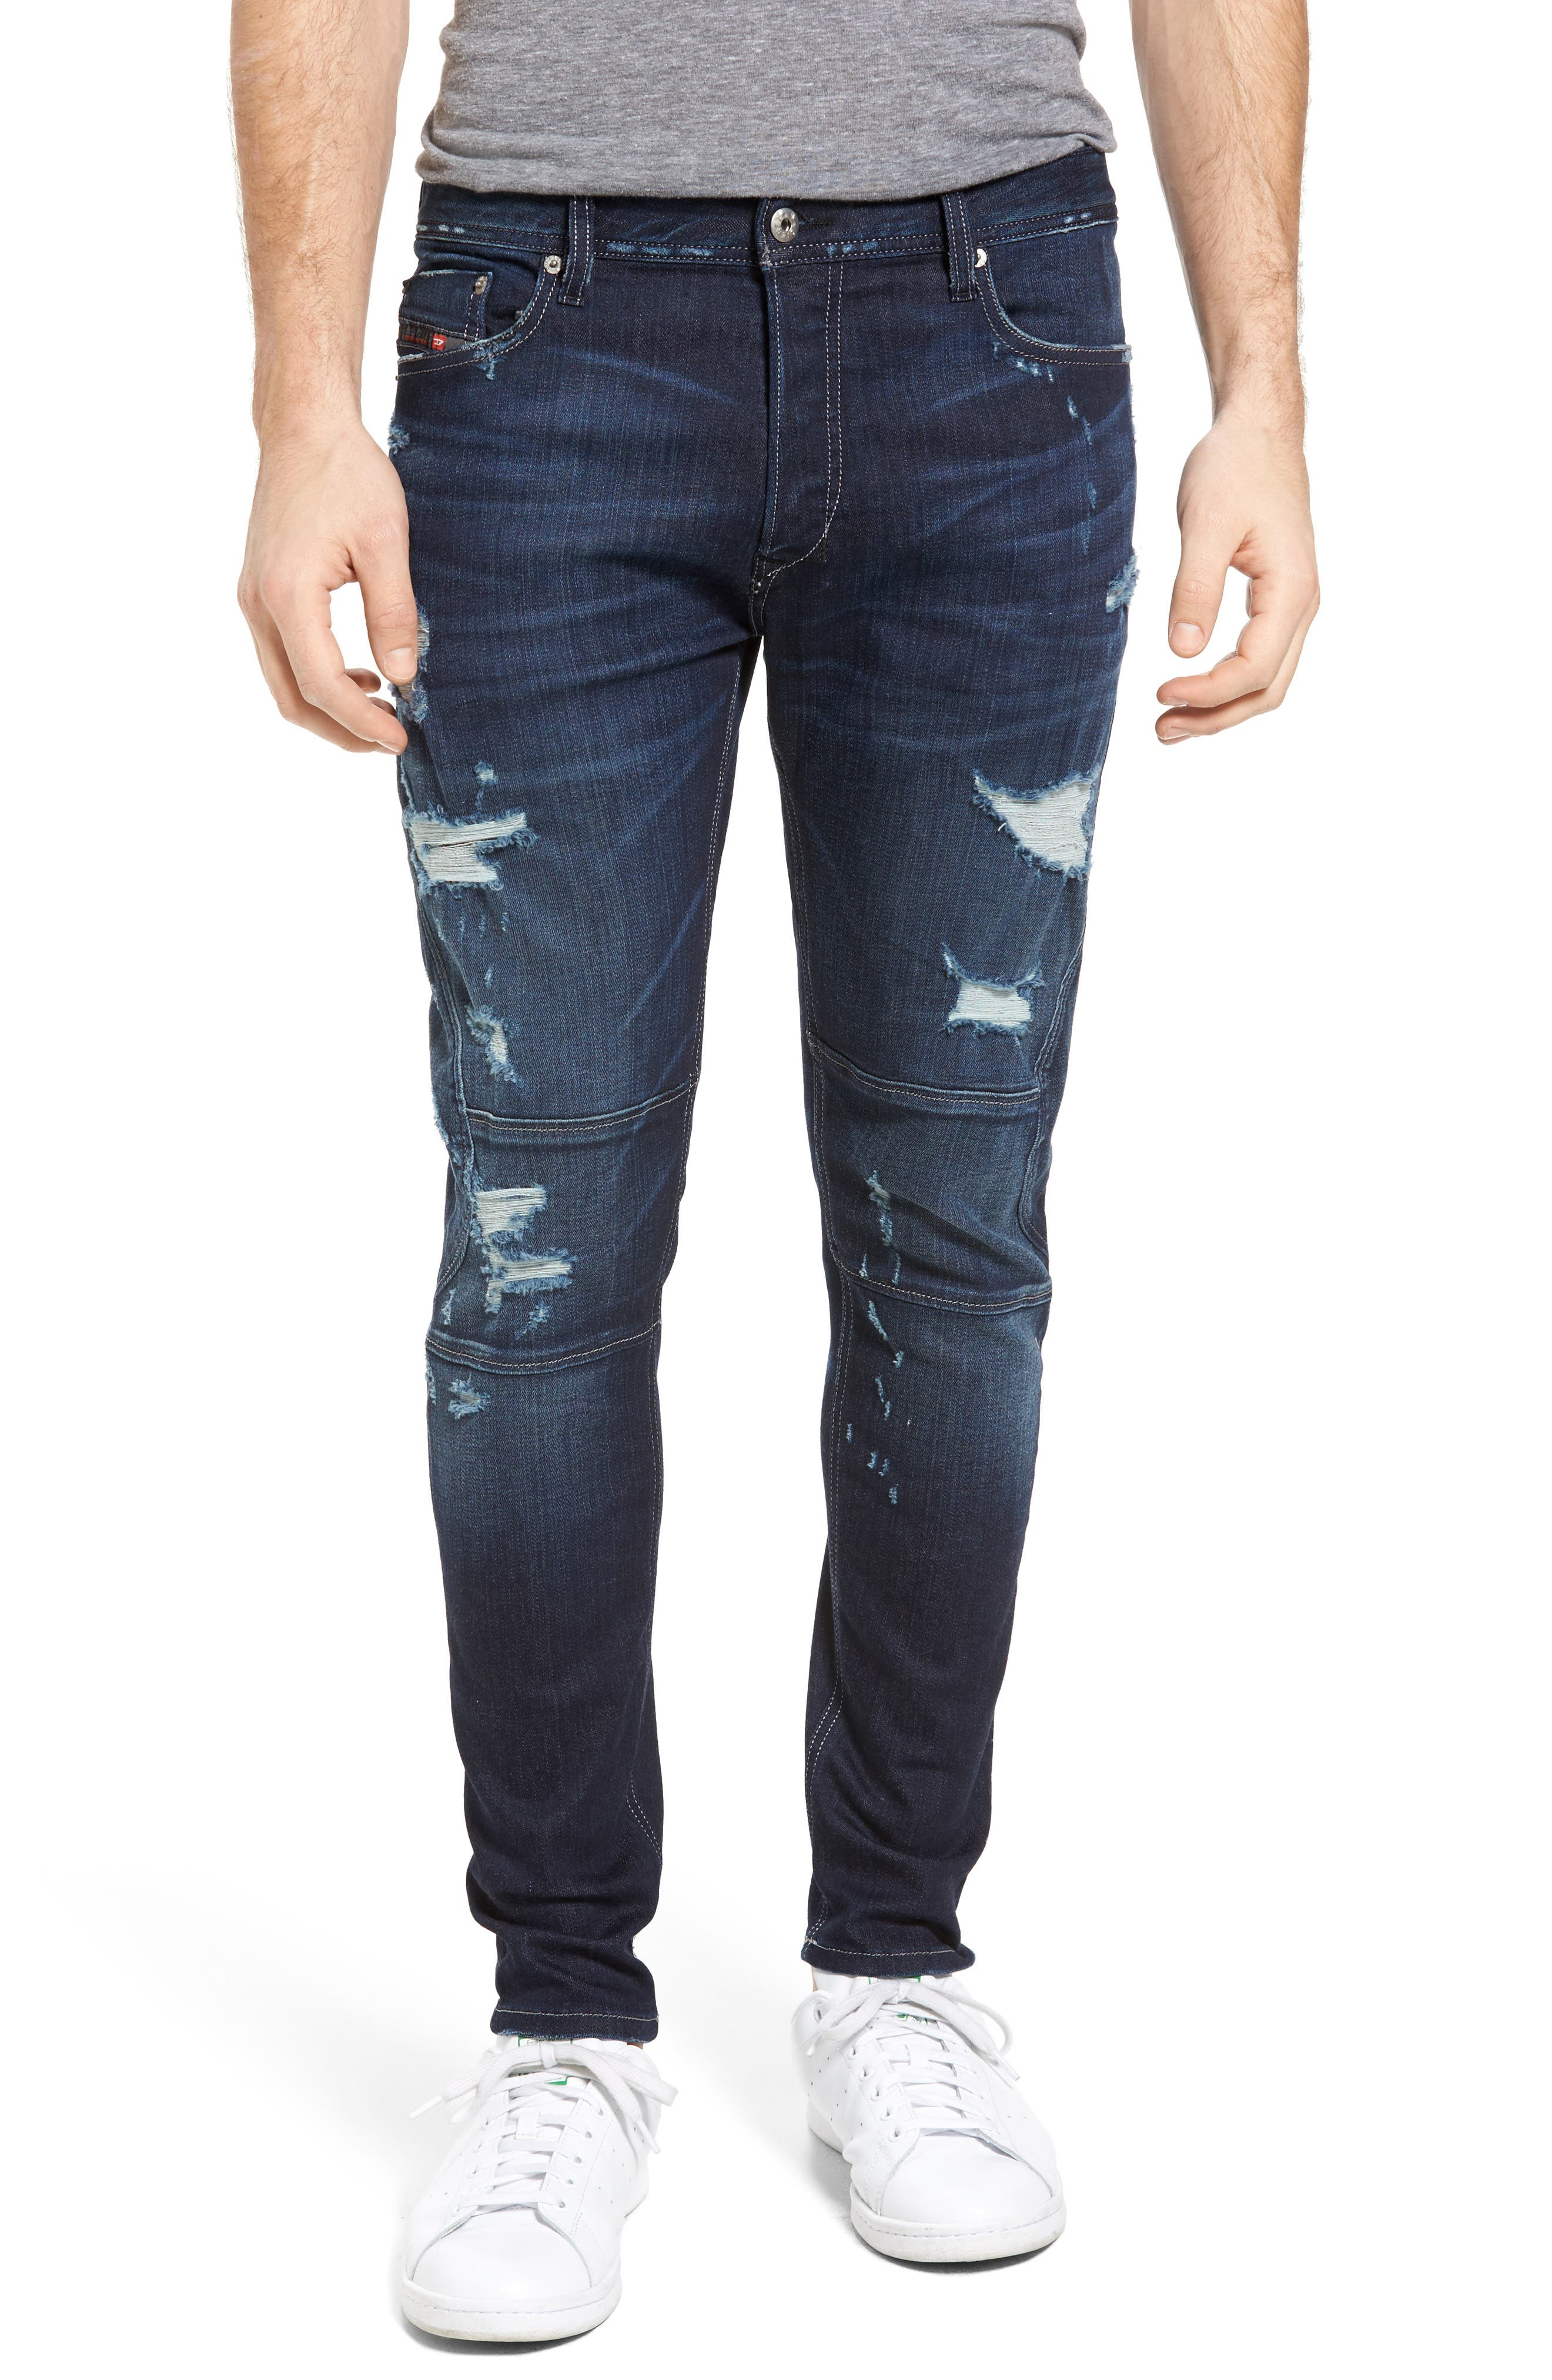 T-Ride Skinny Fit Moto Jeans,                         Main,                         color, U0821